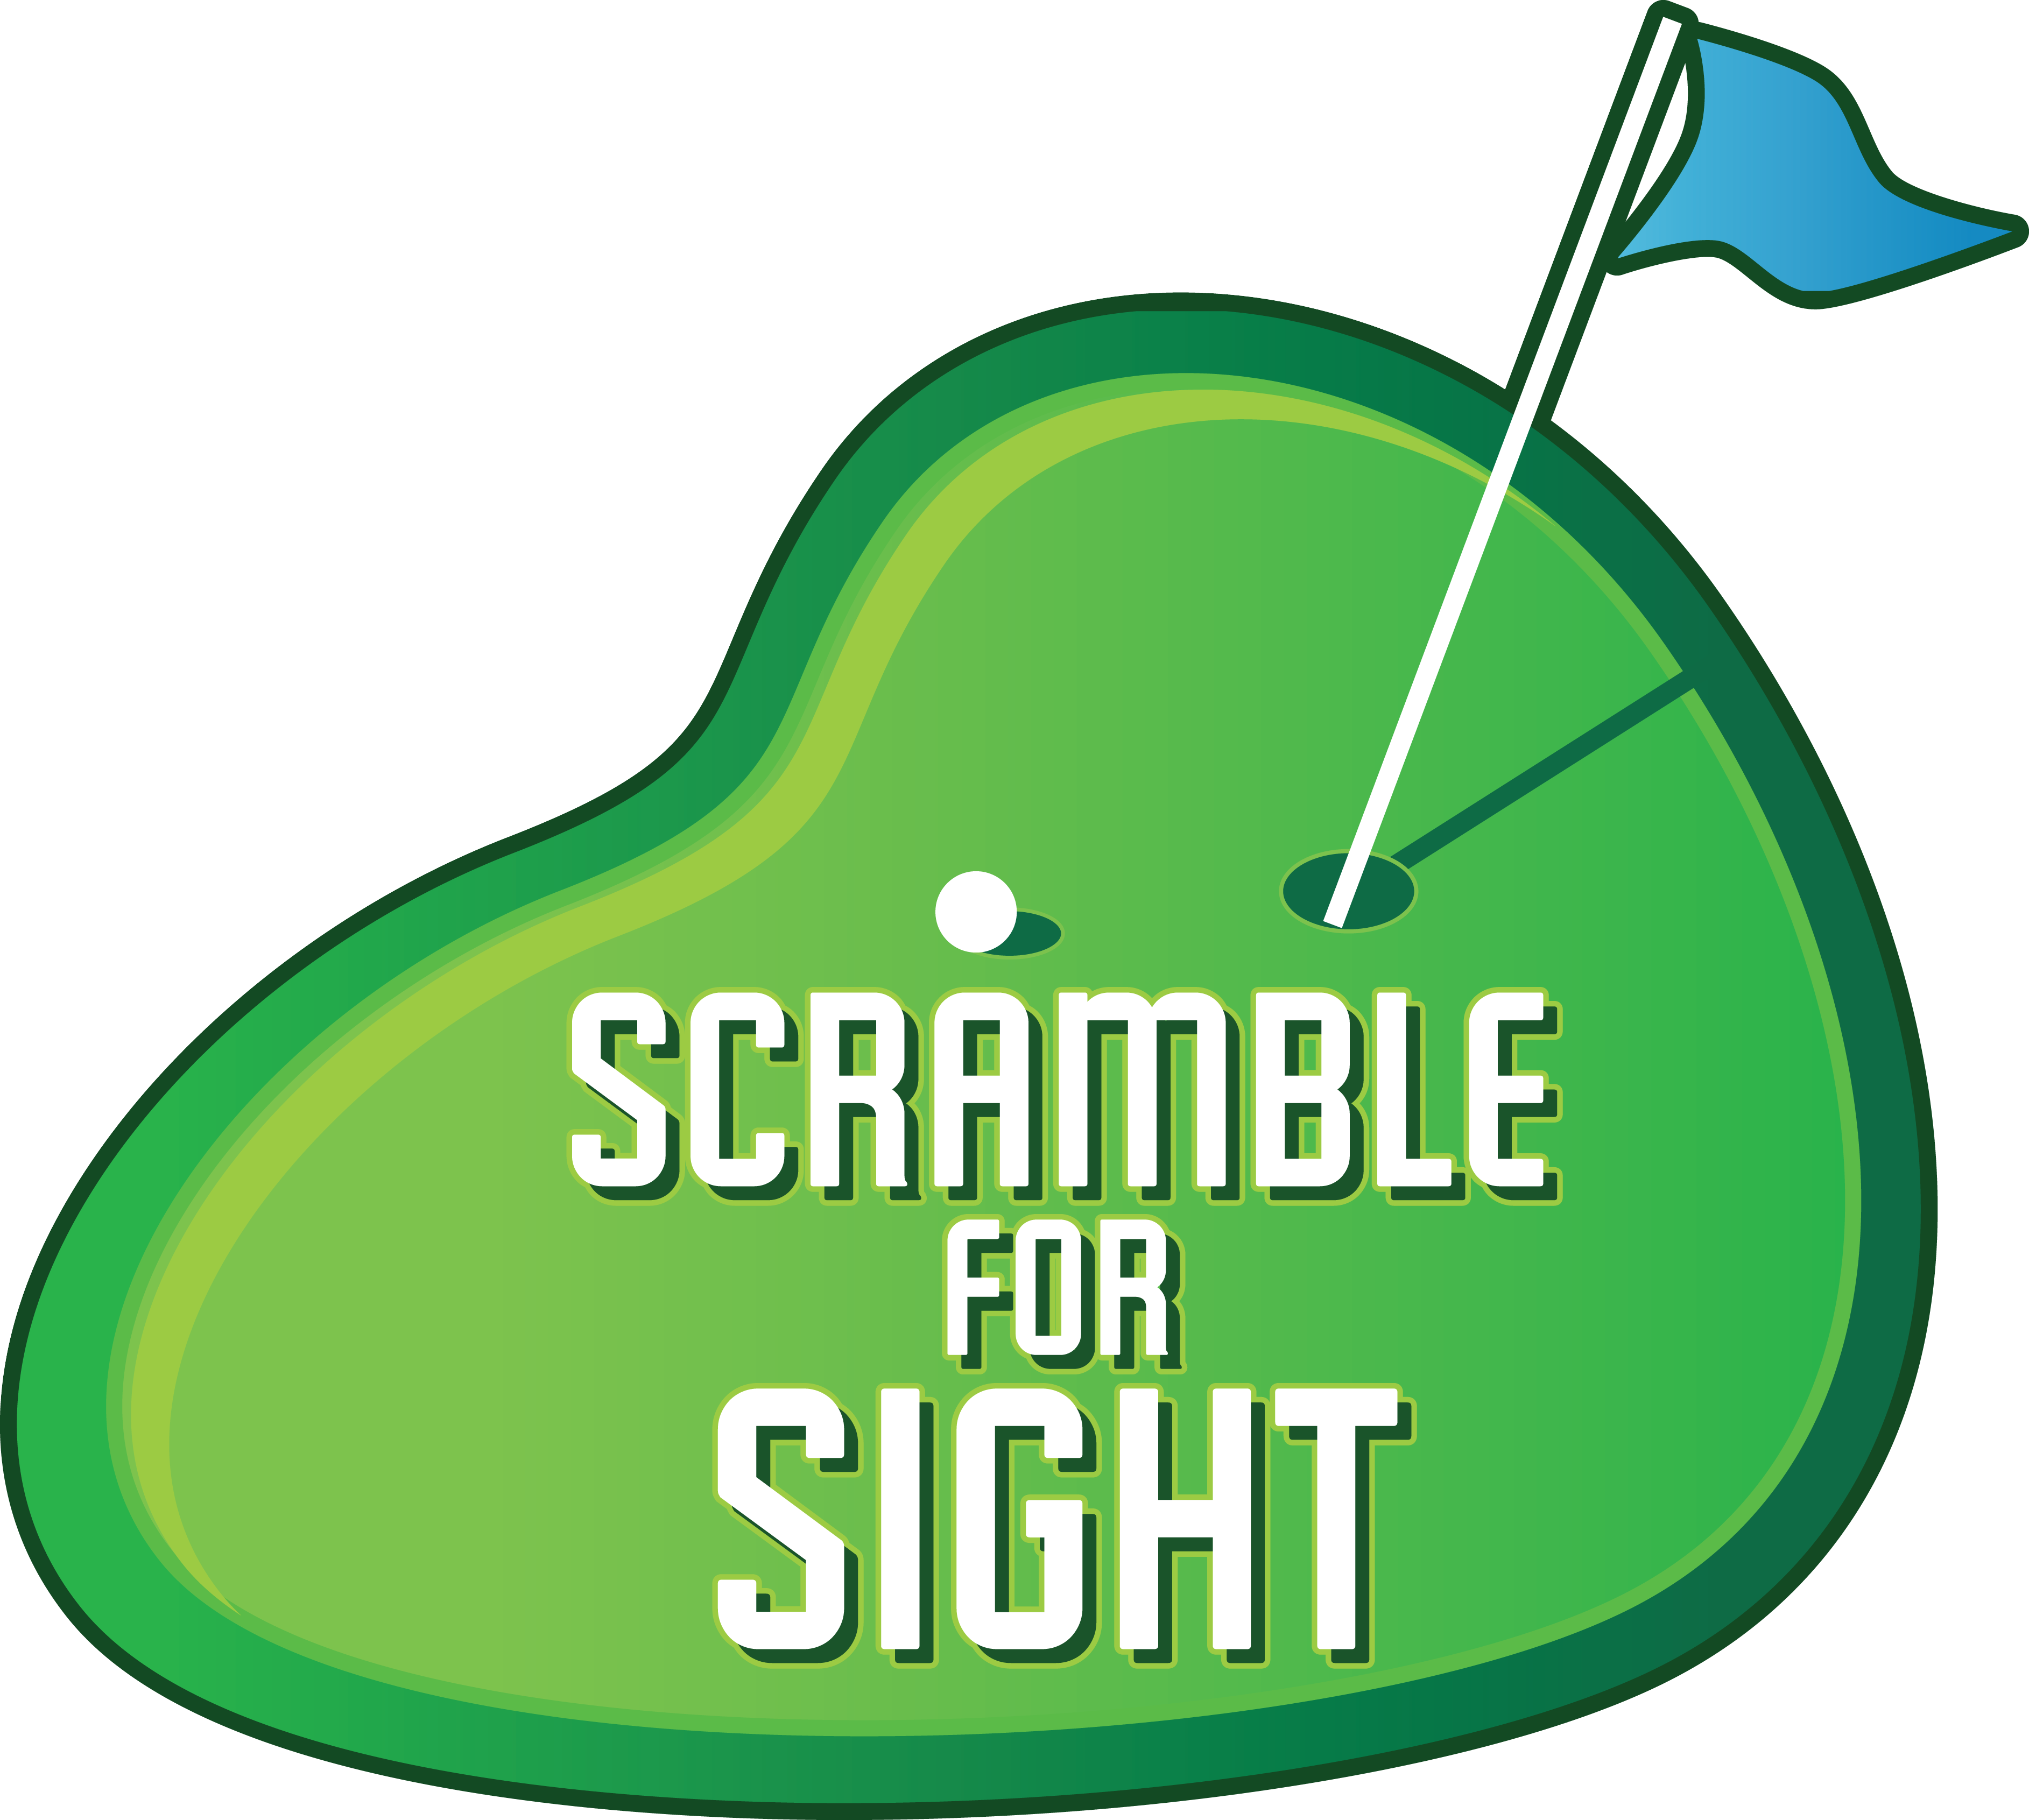 Golf clipart golf scramble. The th annual for